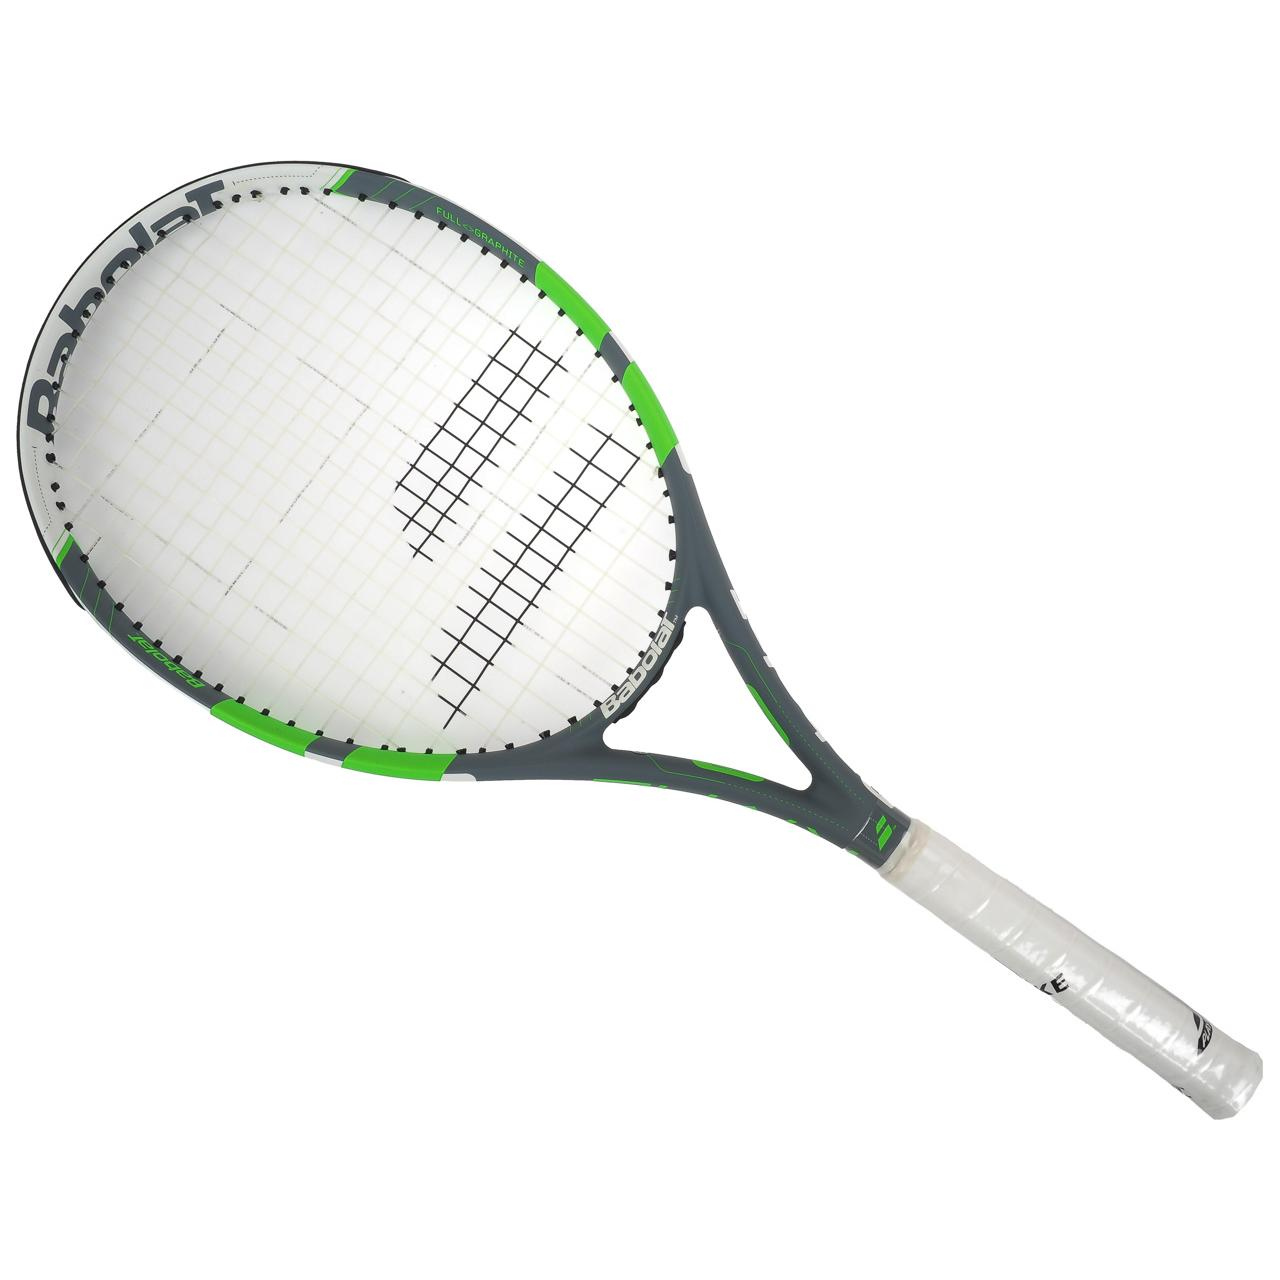 Tennis-Racket-Babolat-Rival-102-Grey-Anise-Grey-70076-New